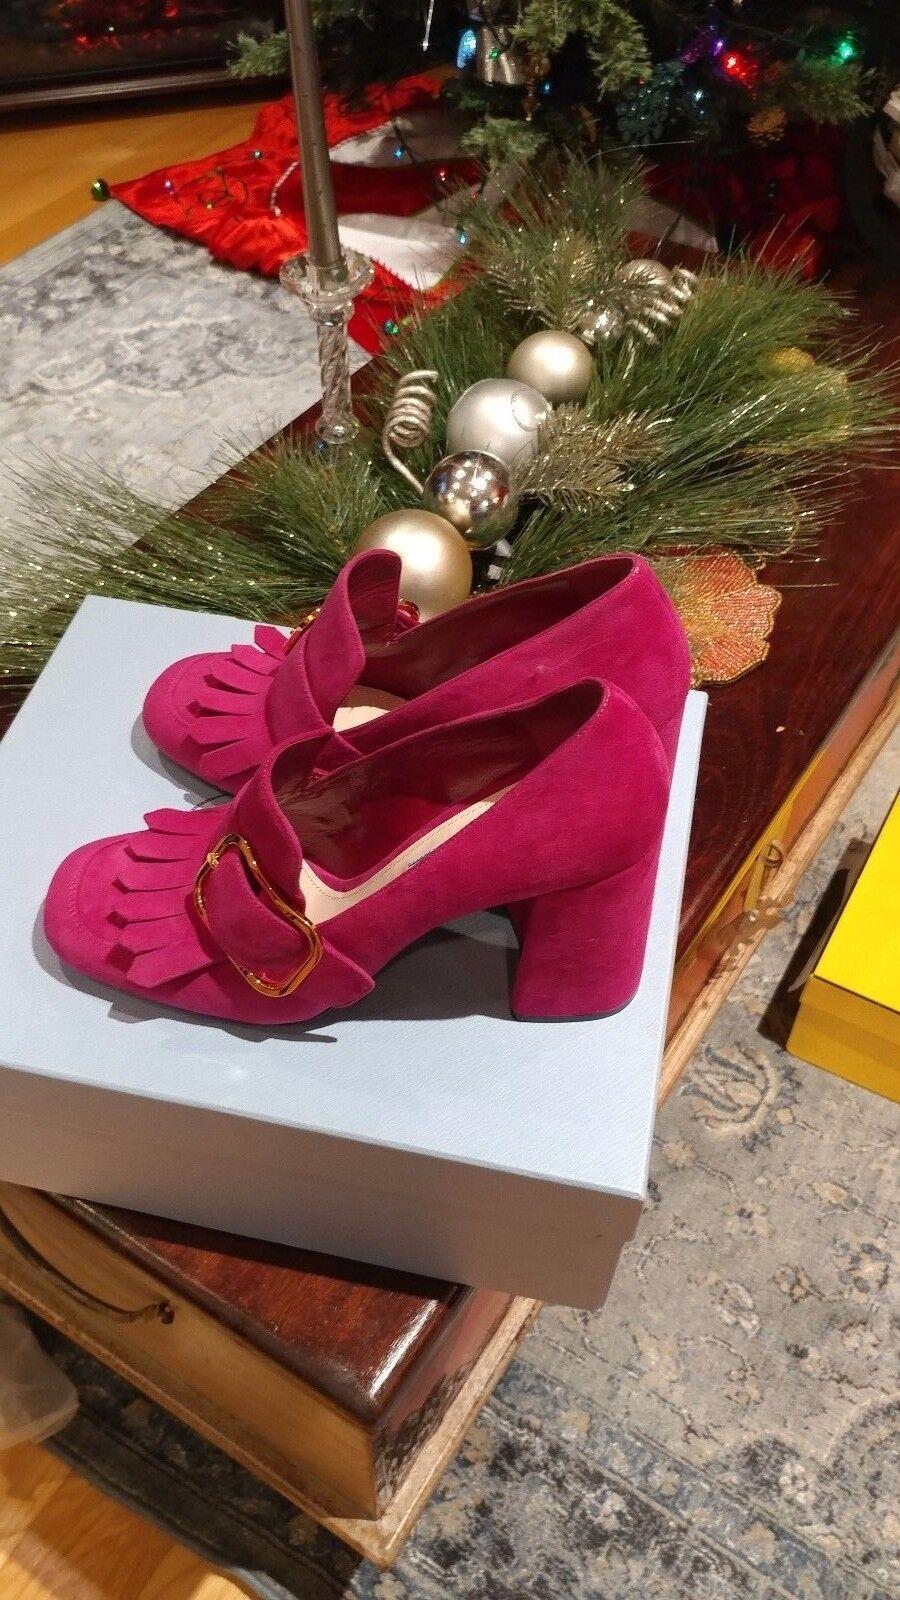 Prada   Women Women Women Suede Buckle New shoes size EUR 38  US 7.5  retail   790.00 18238e